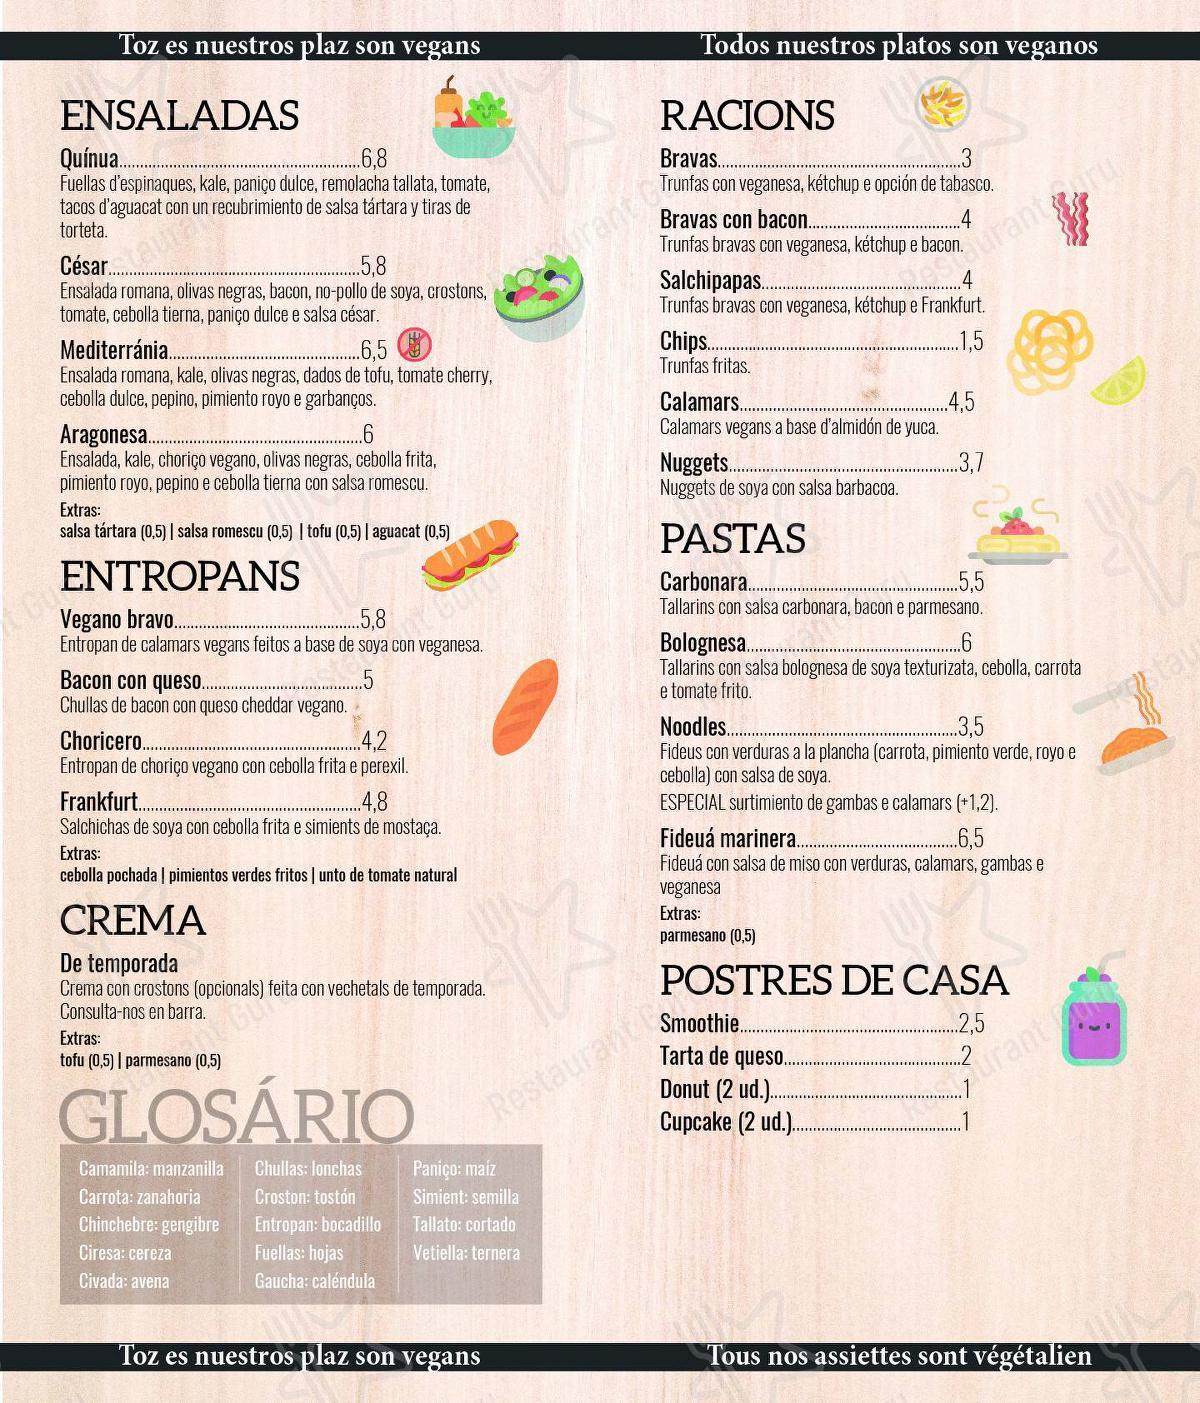 A Flama menu - meals and drinks